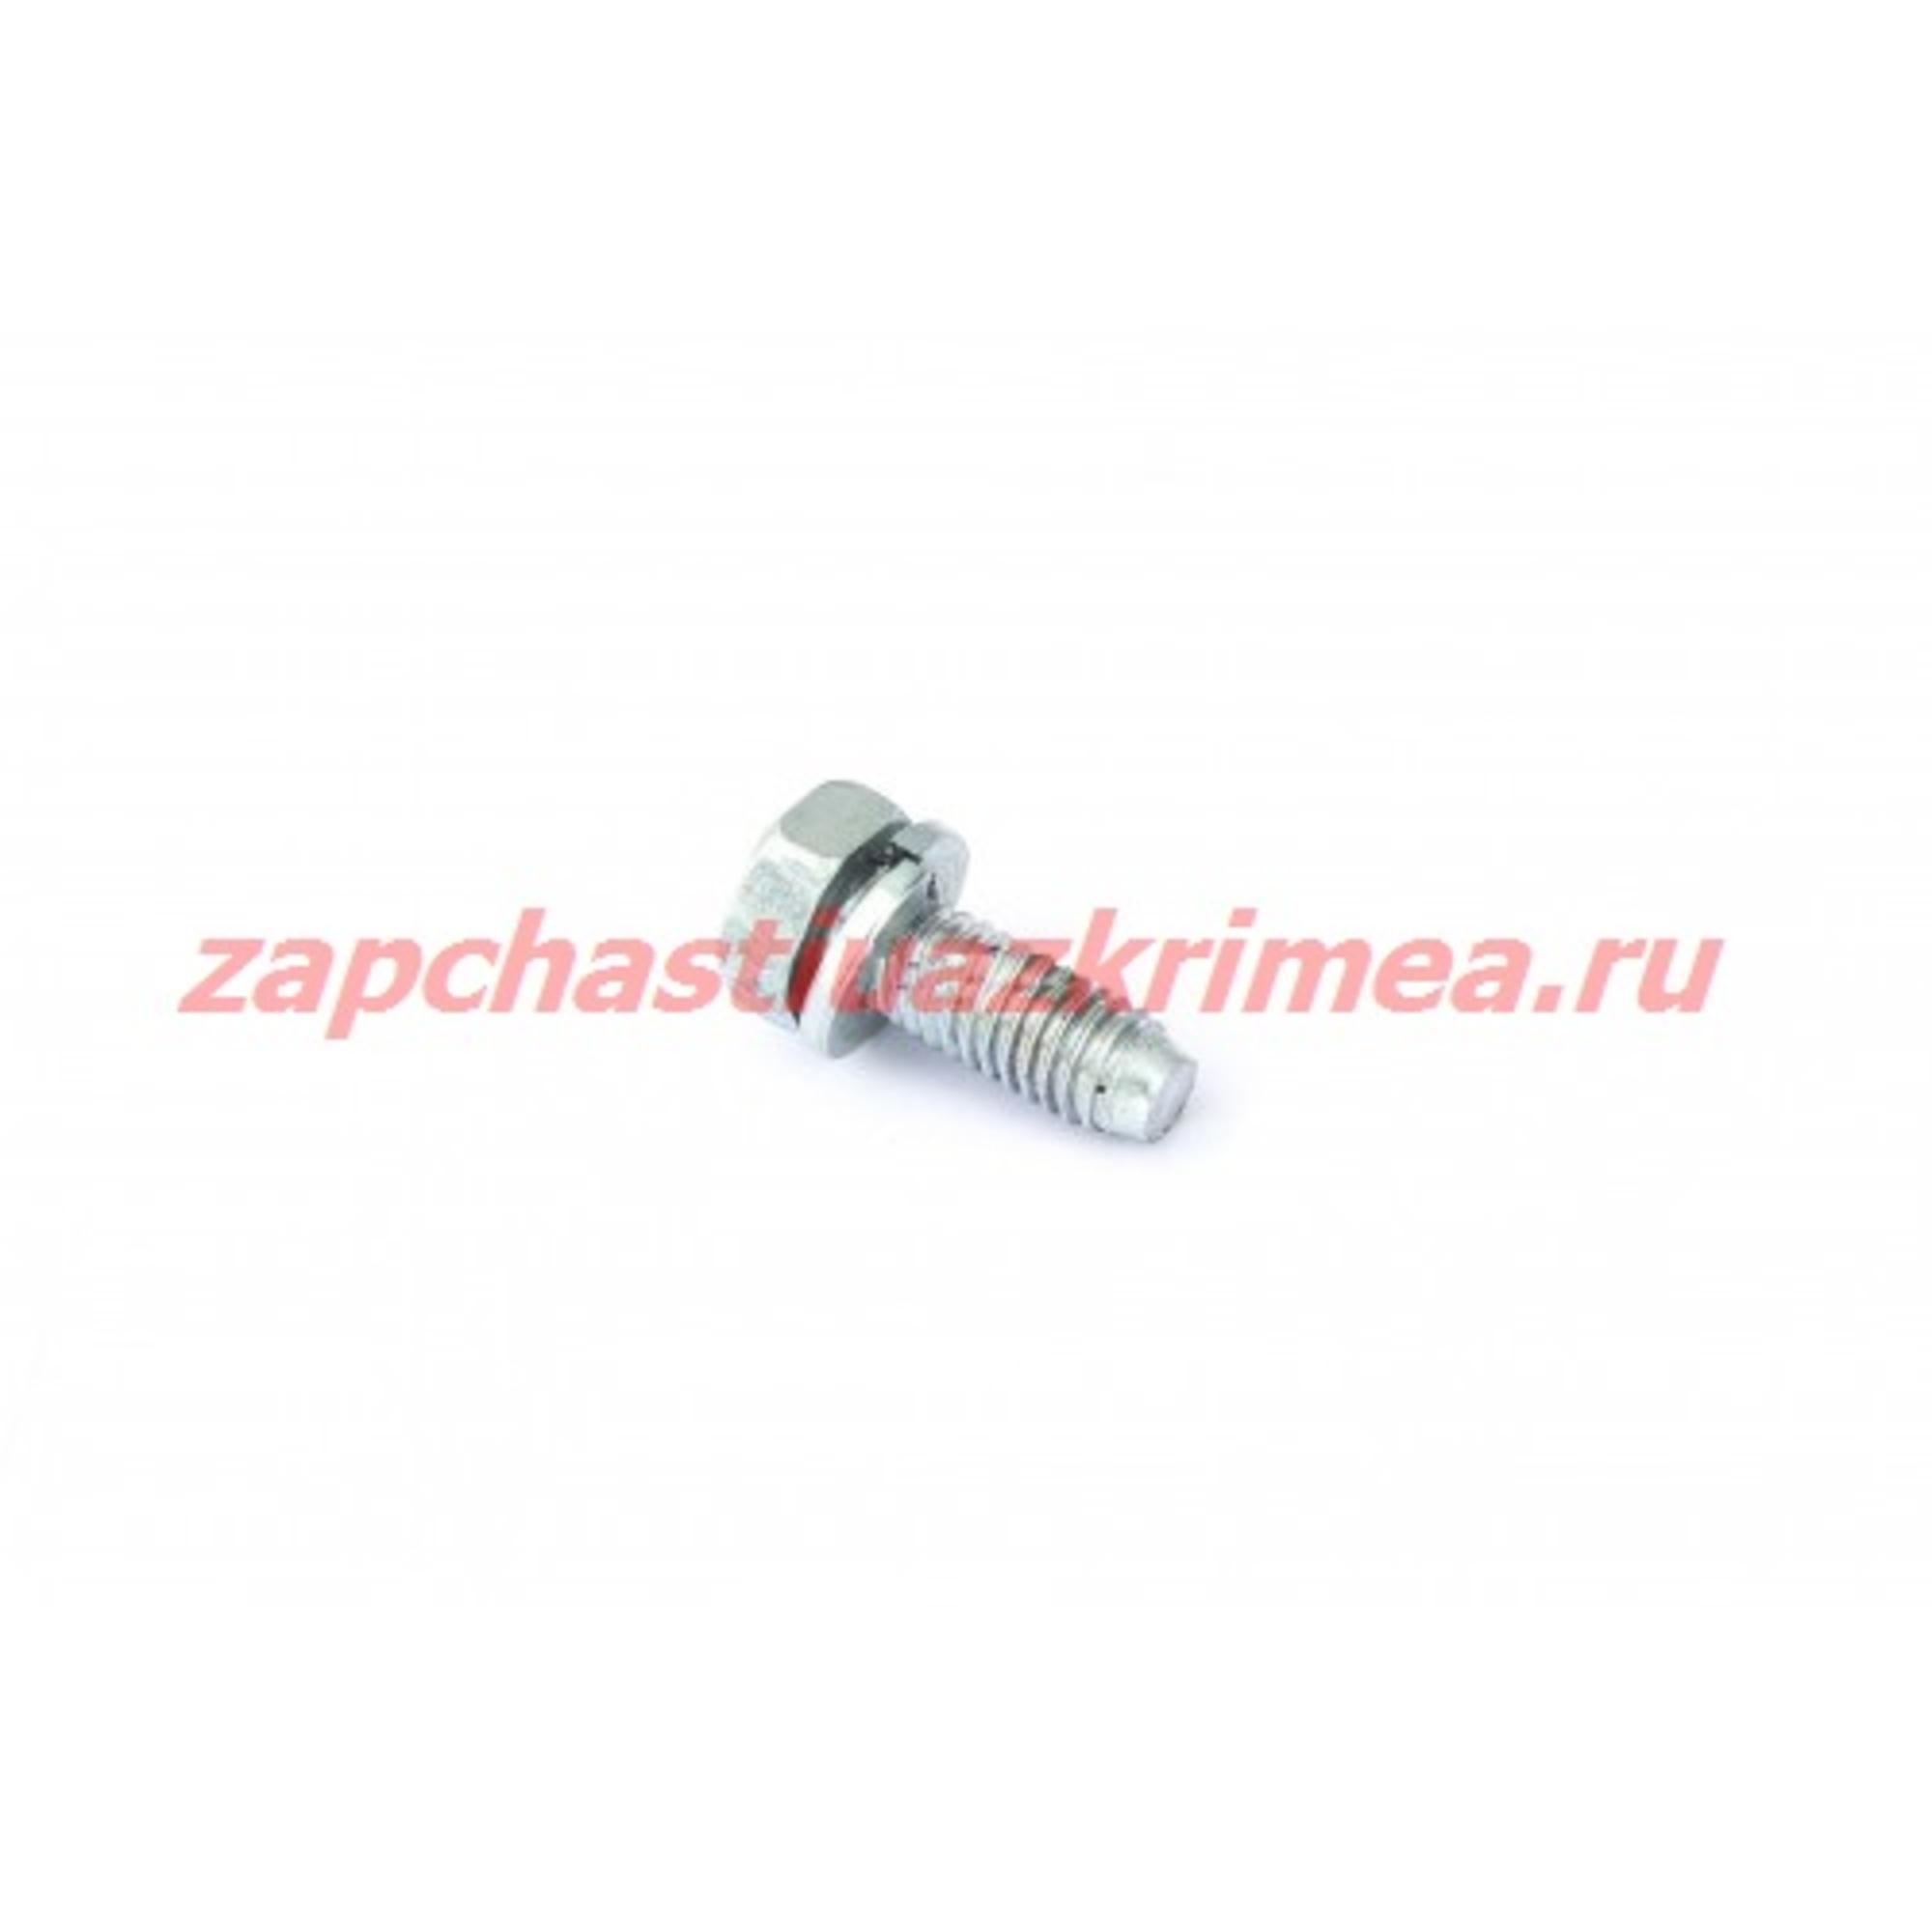 Болт М6х1.0х16 УАЗ Патриот на РК DYMOS S1123006161